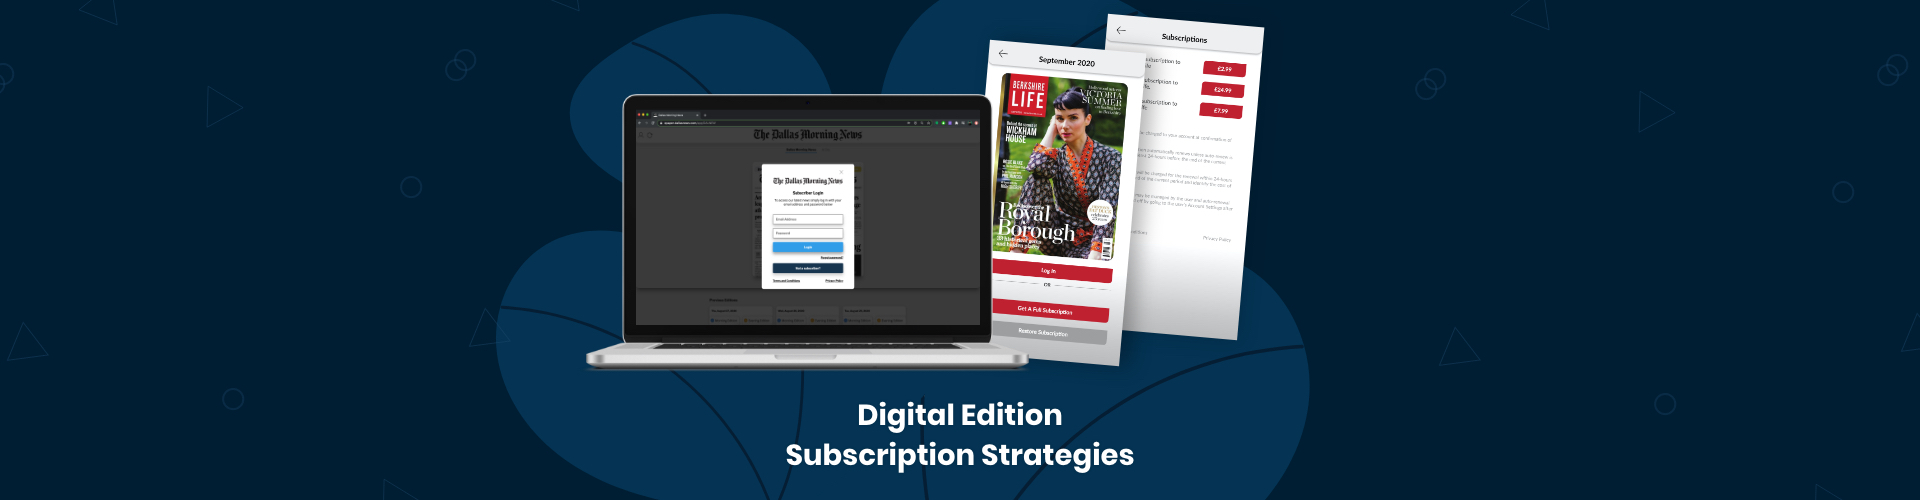 Digital Edition Subscription Strategies